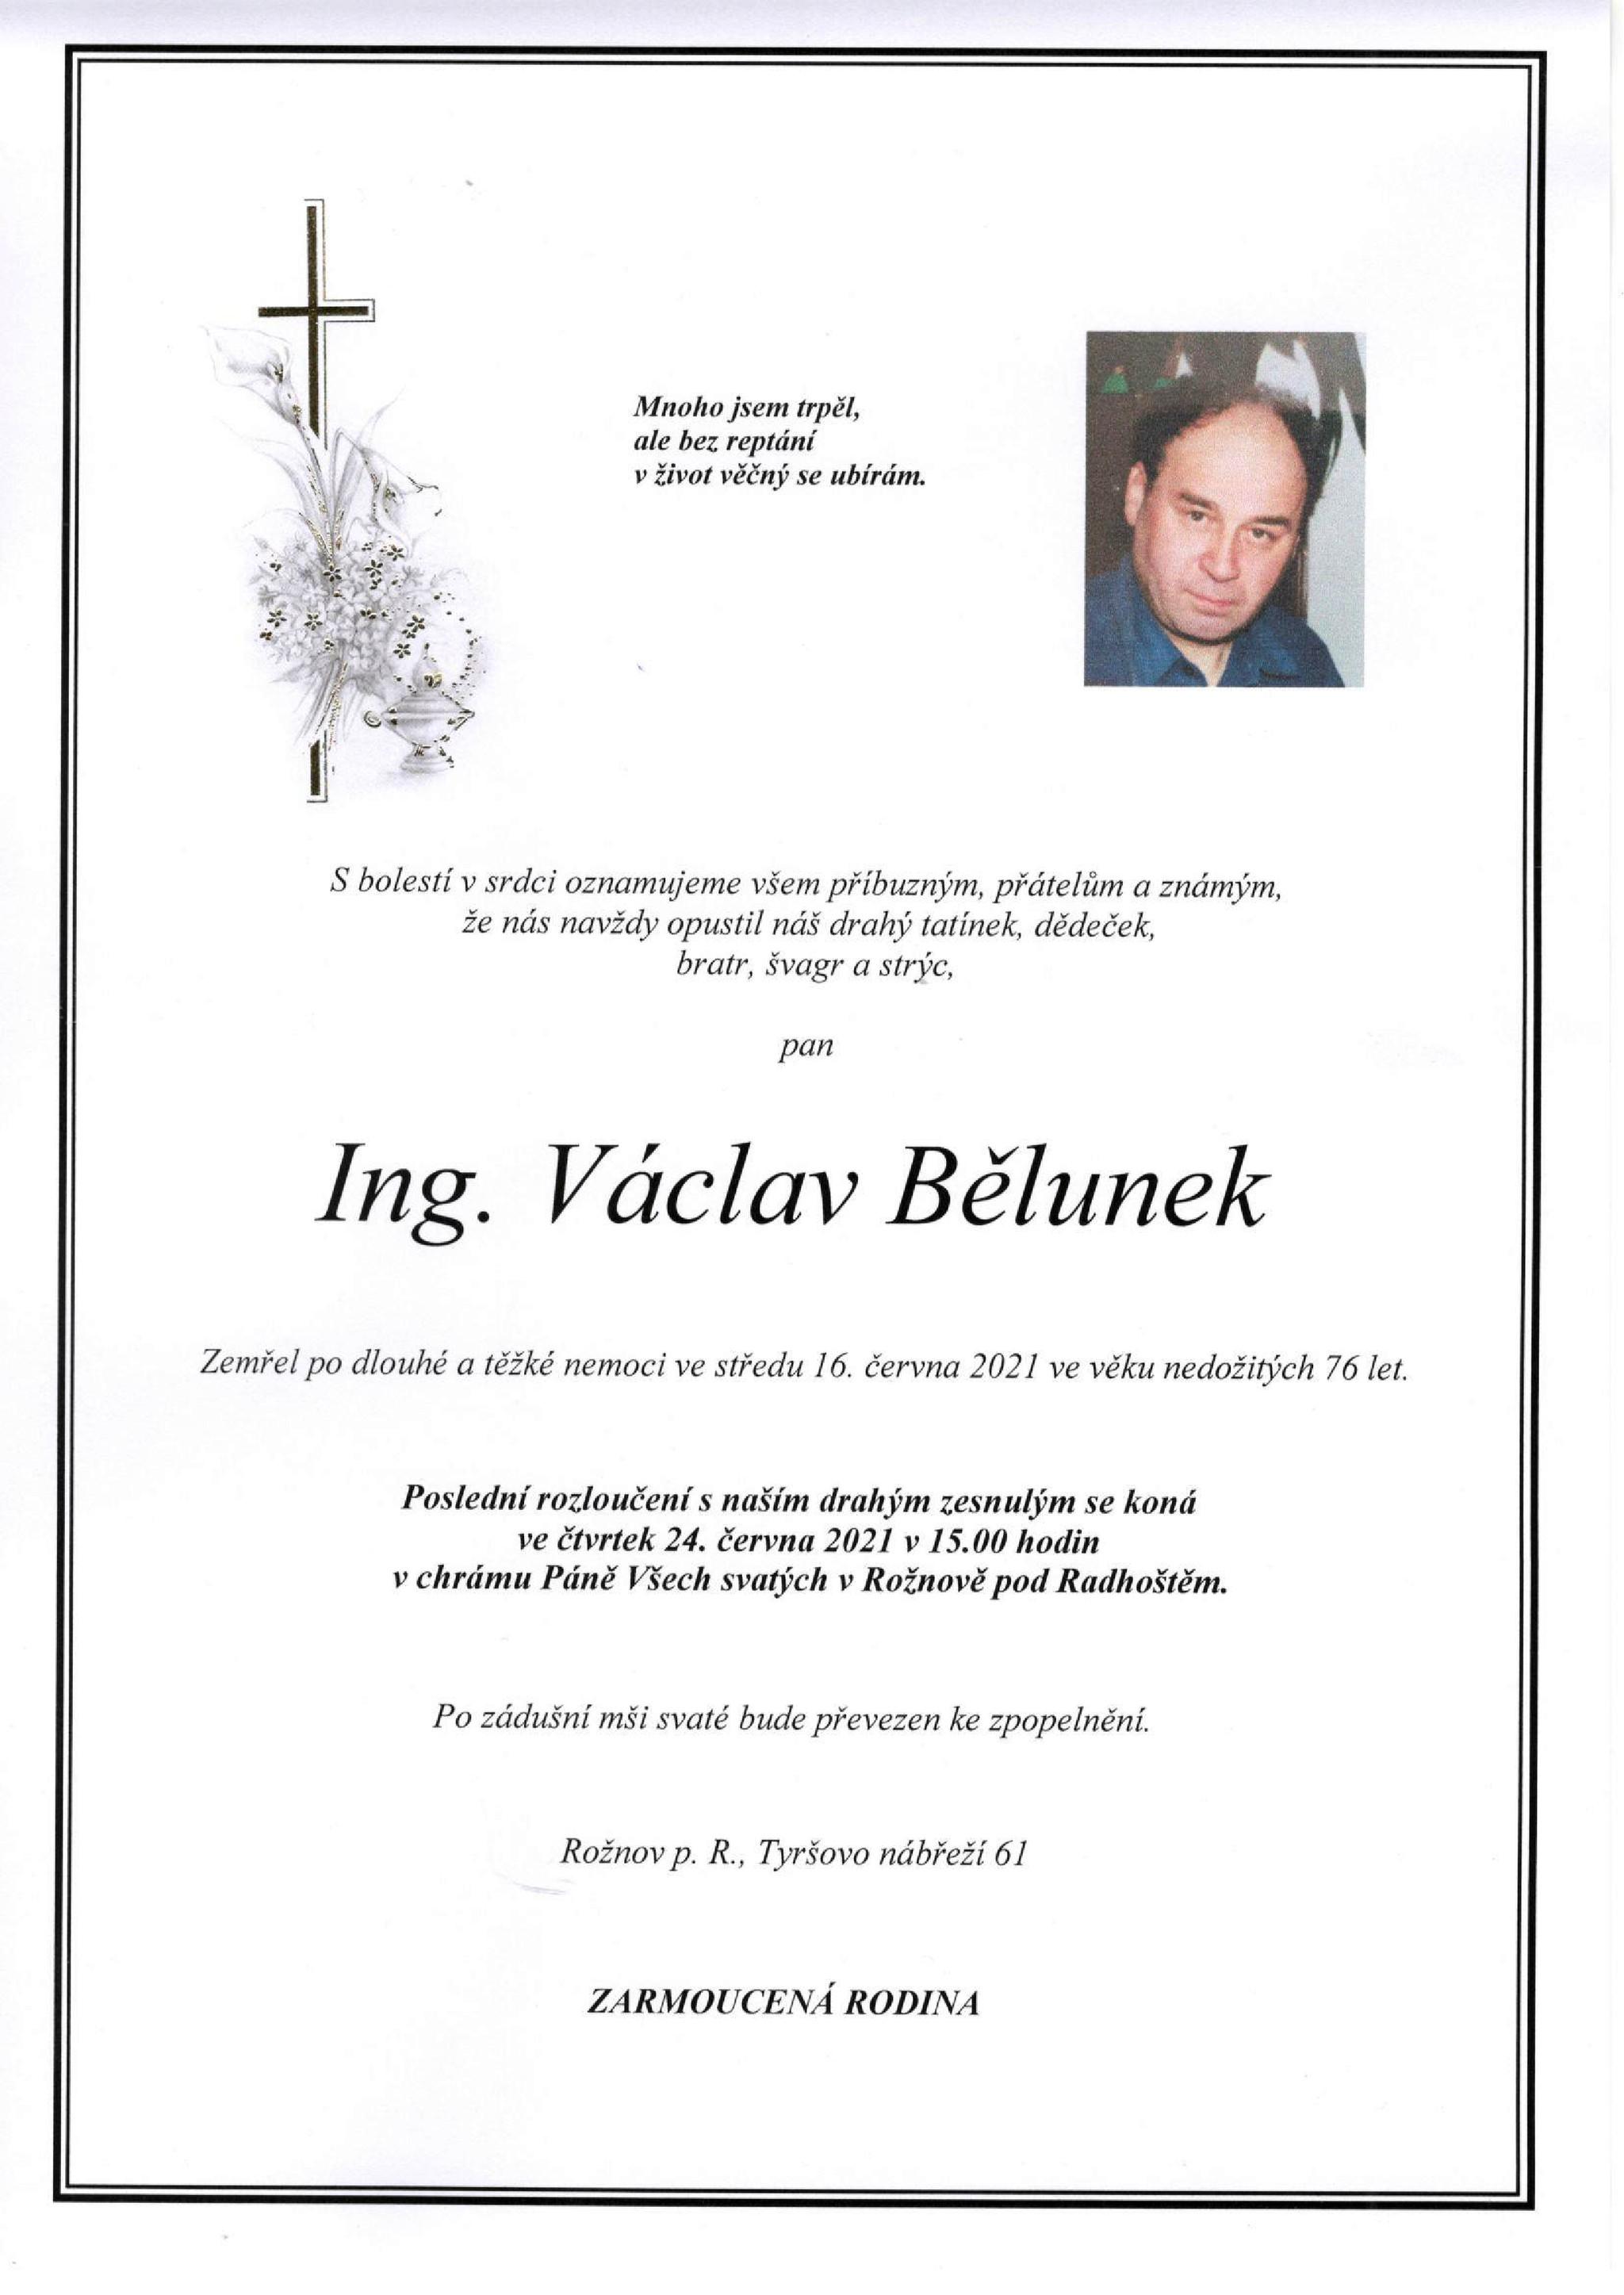 Ing. Václav Bělunek